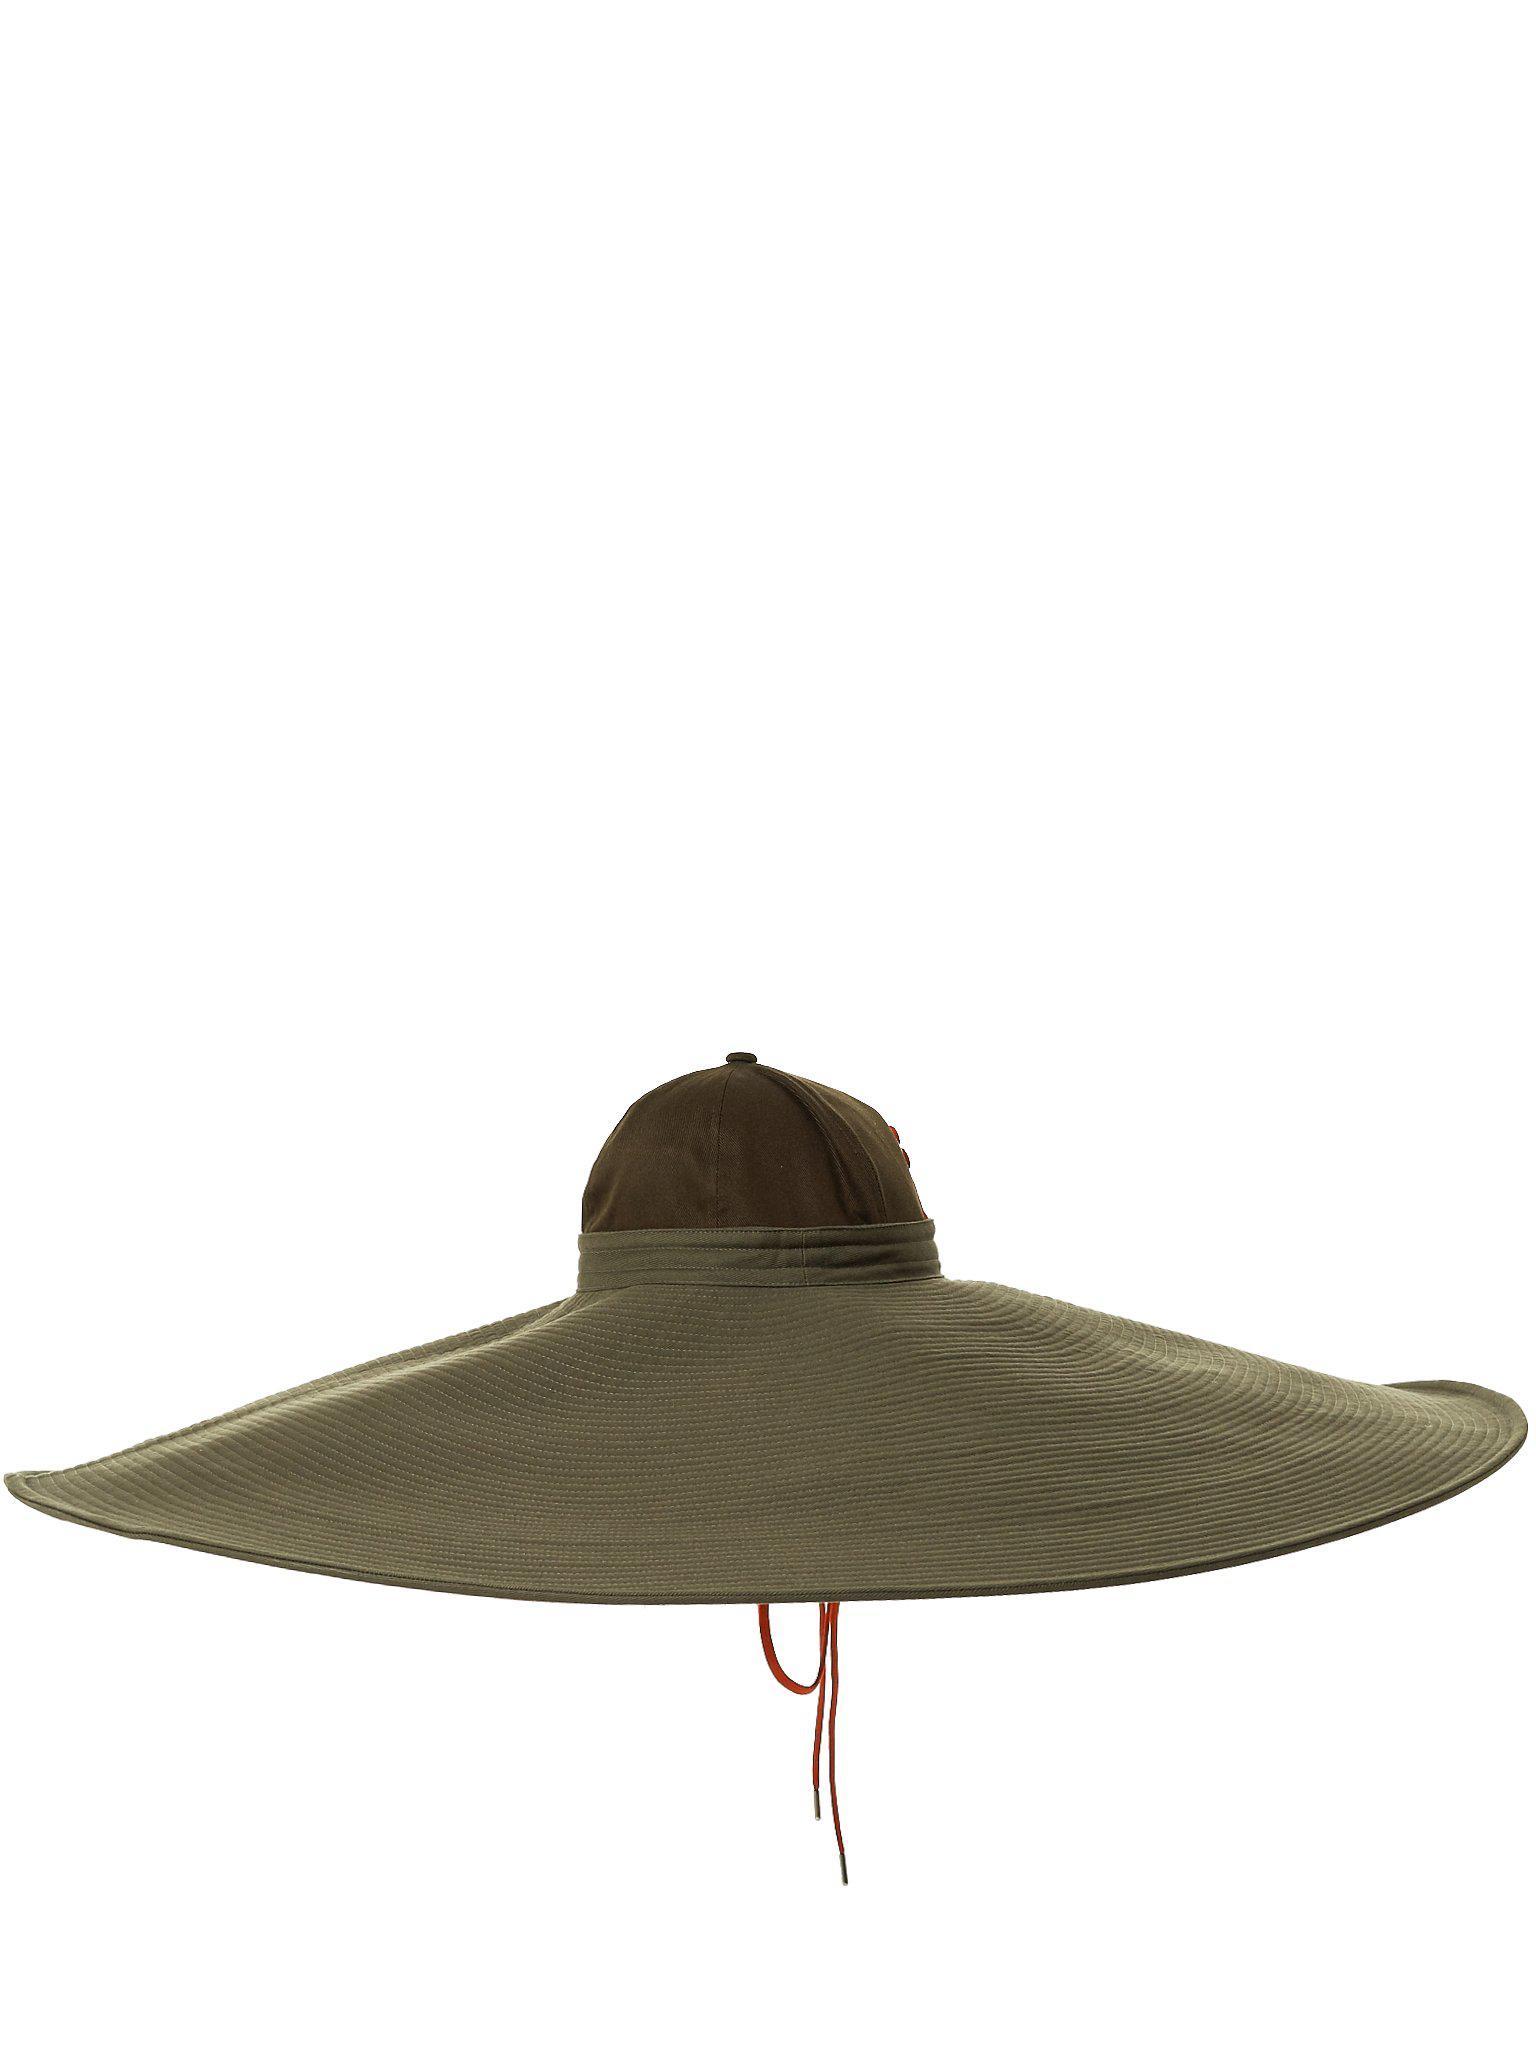 e9ad23a3 Ambush Oversized Assemblage Hat in Green - Lyst